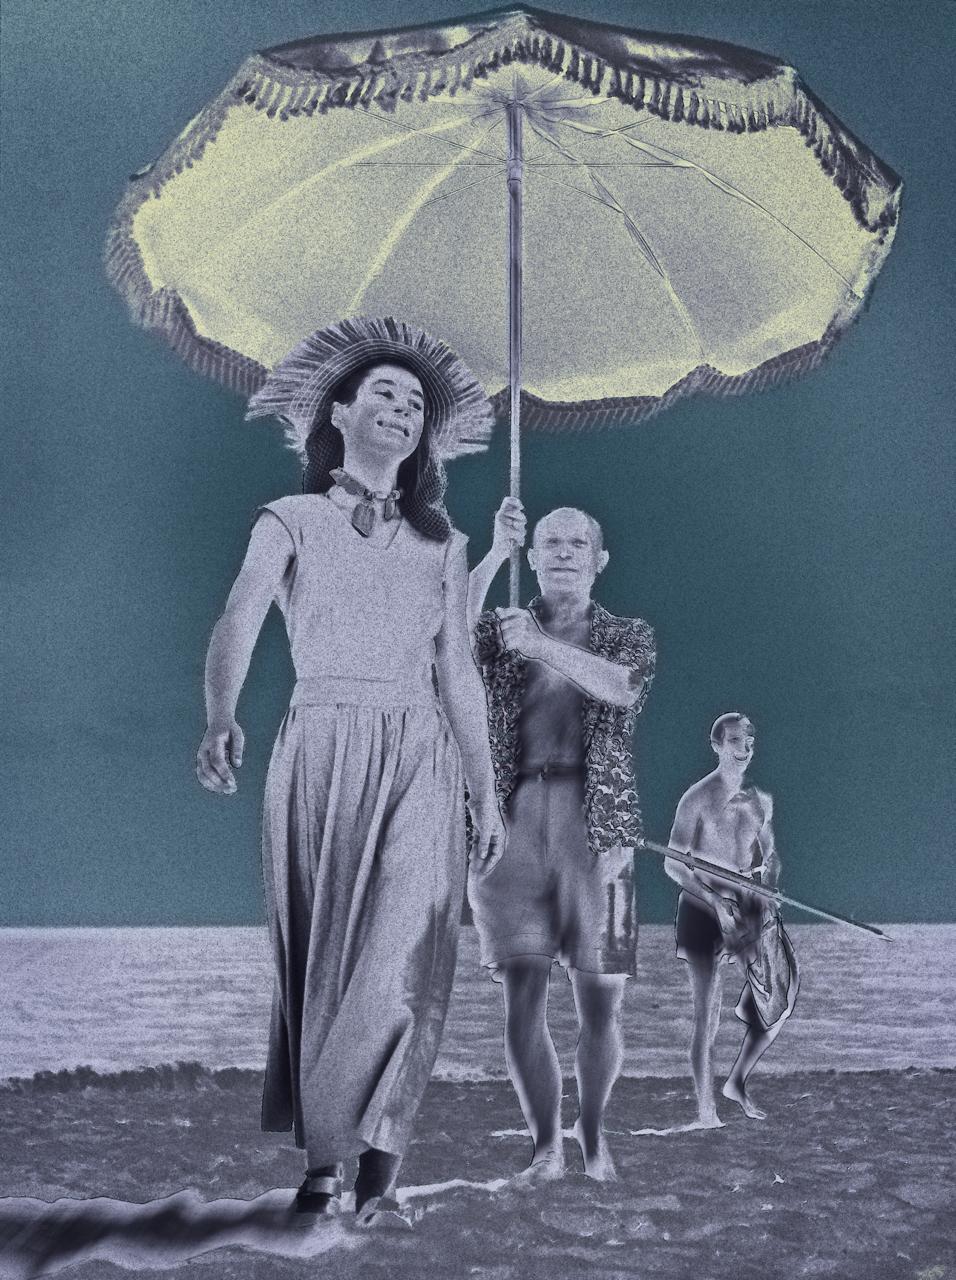 Capa, Robert (Pablo Picasso and Françoise Gilot 1951)